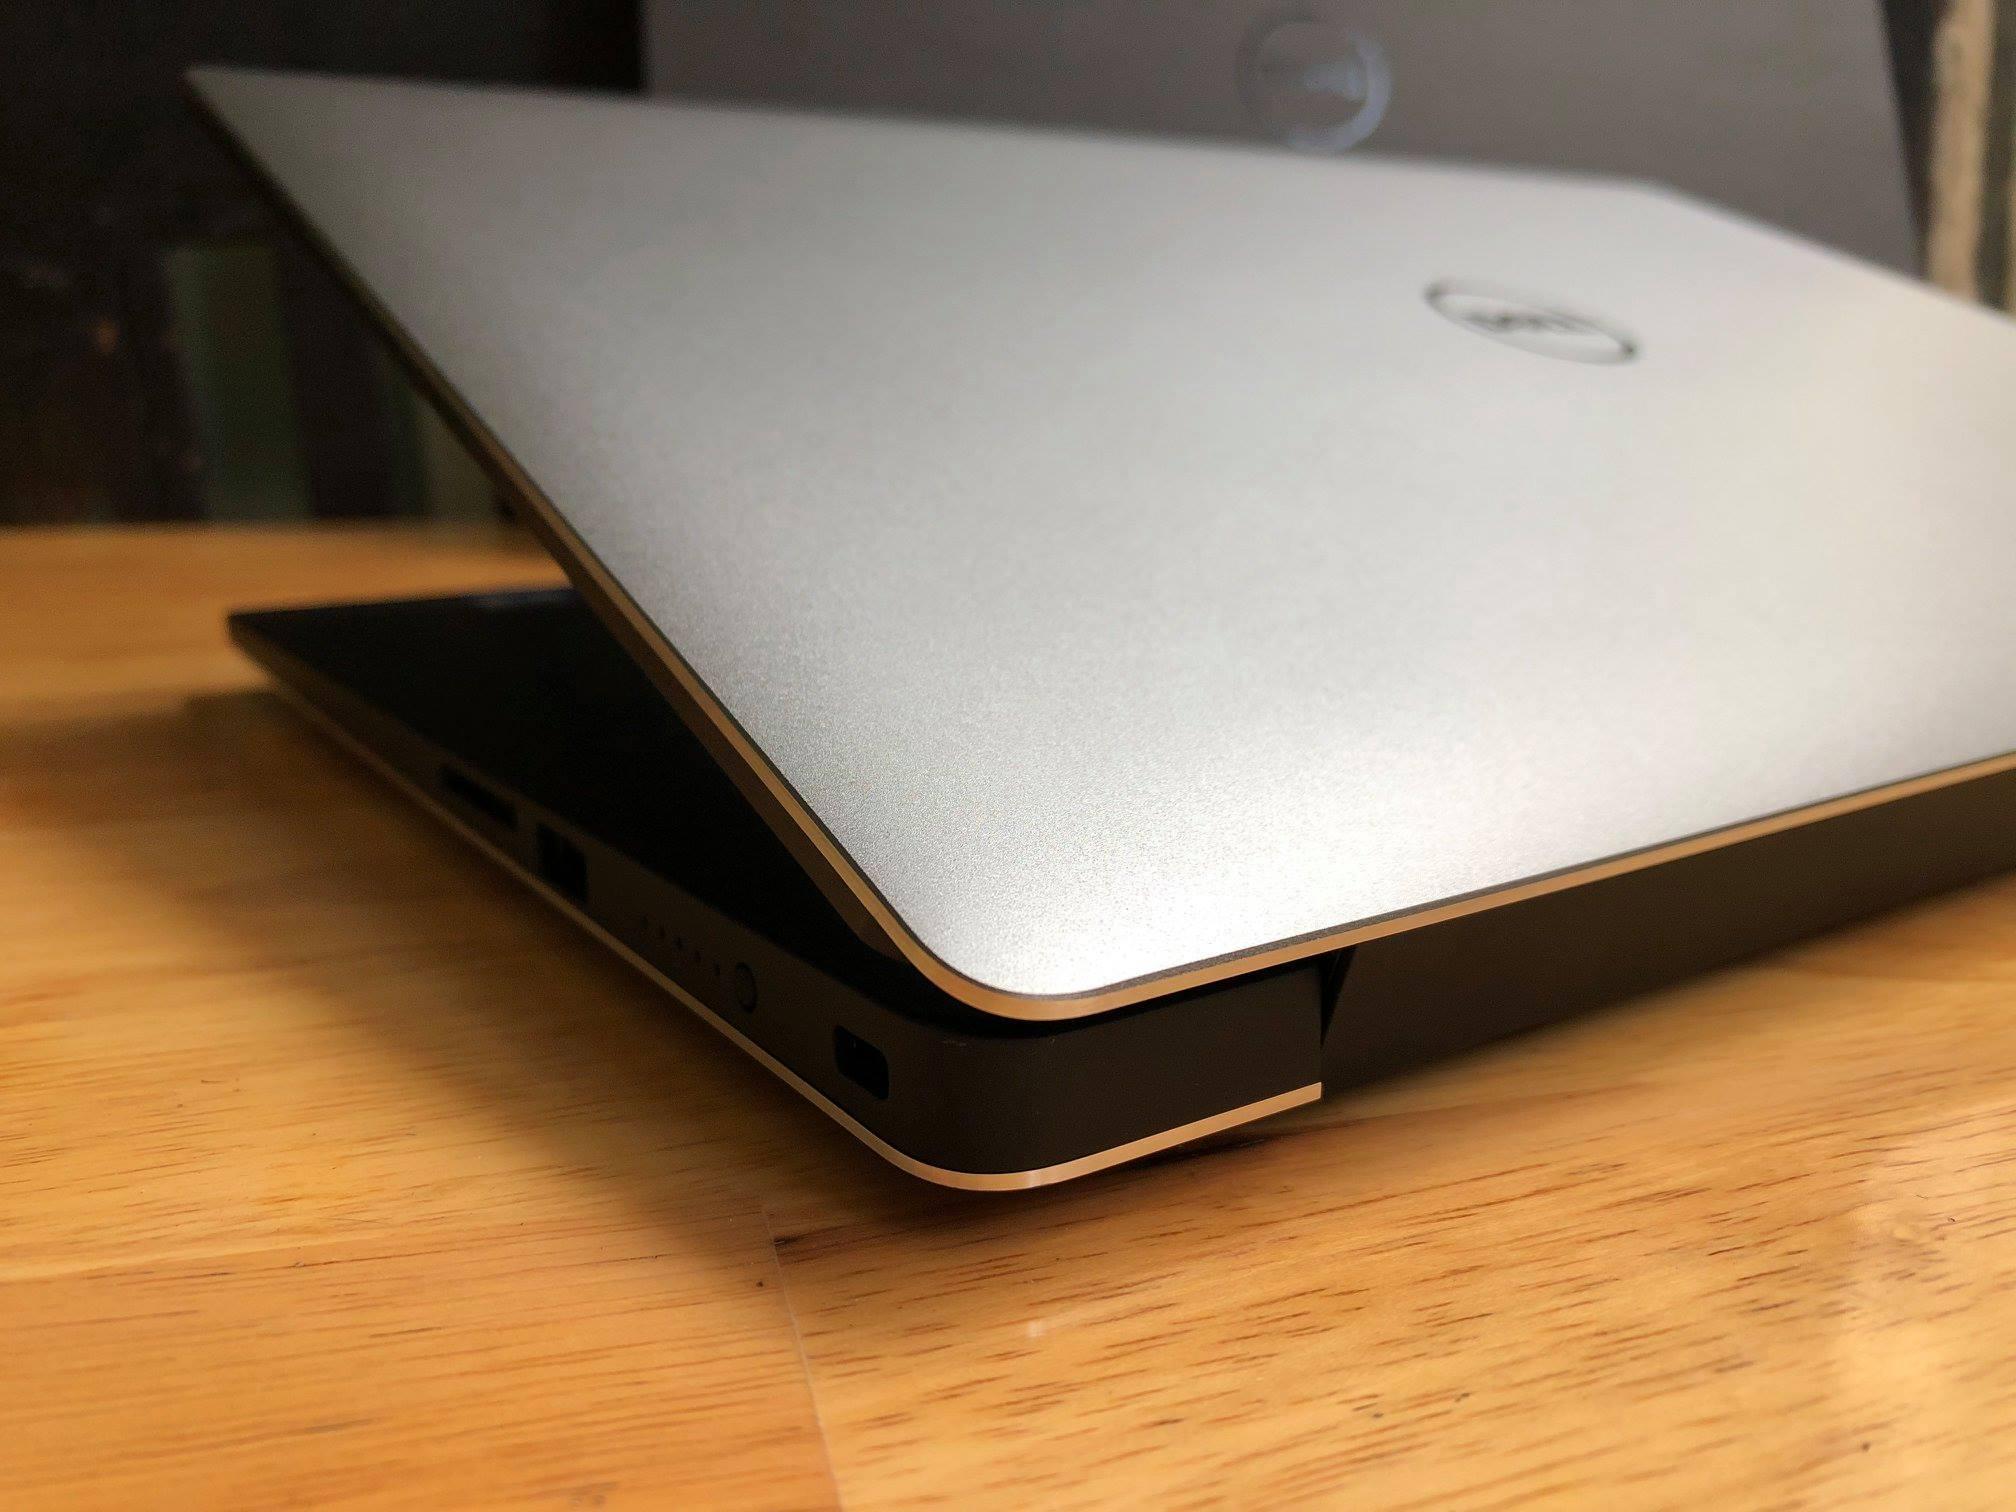 ==> bán 50 cái laptop Dell ... Core i3, i5, i7 ...máy đẹp, zin all. - 49